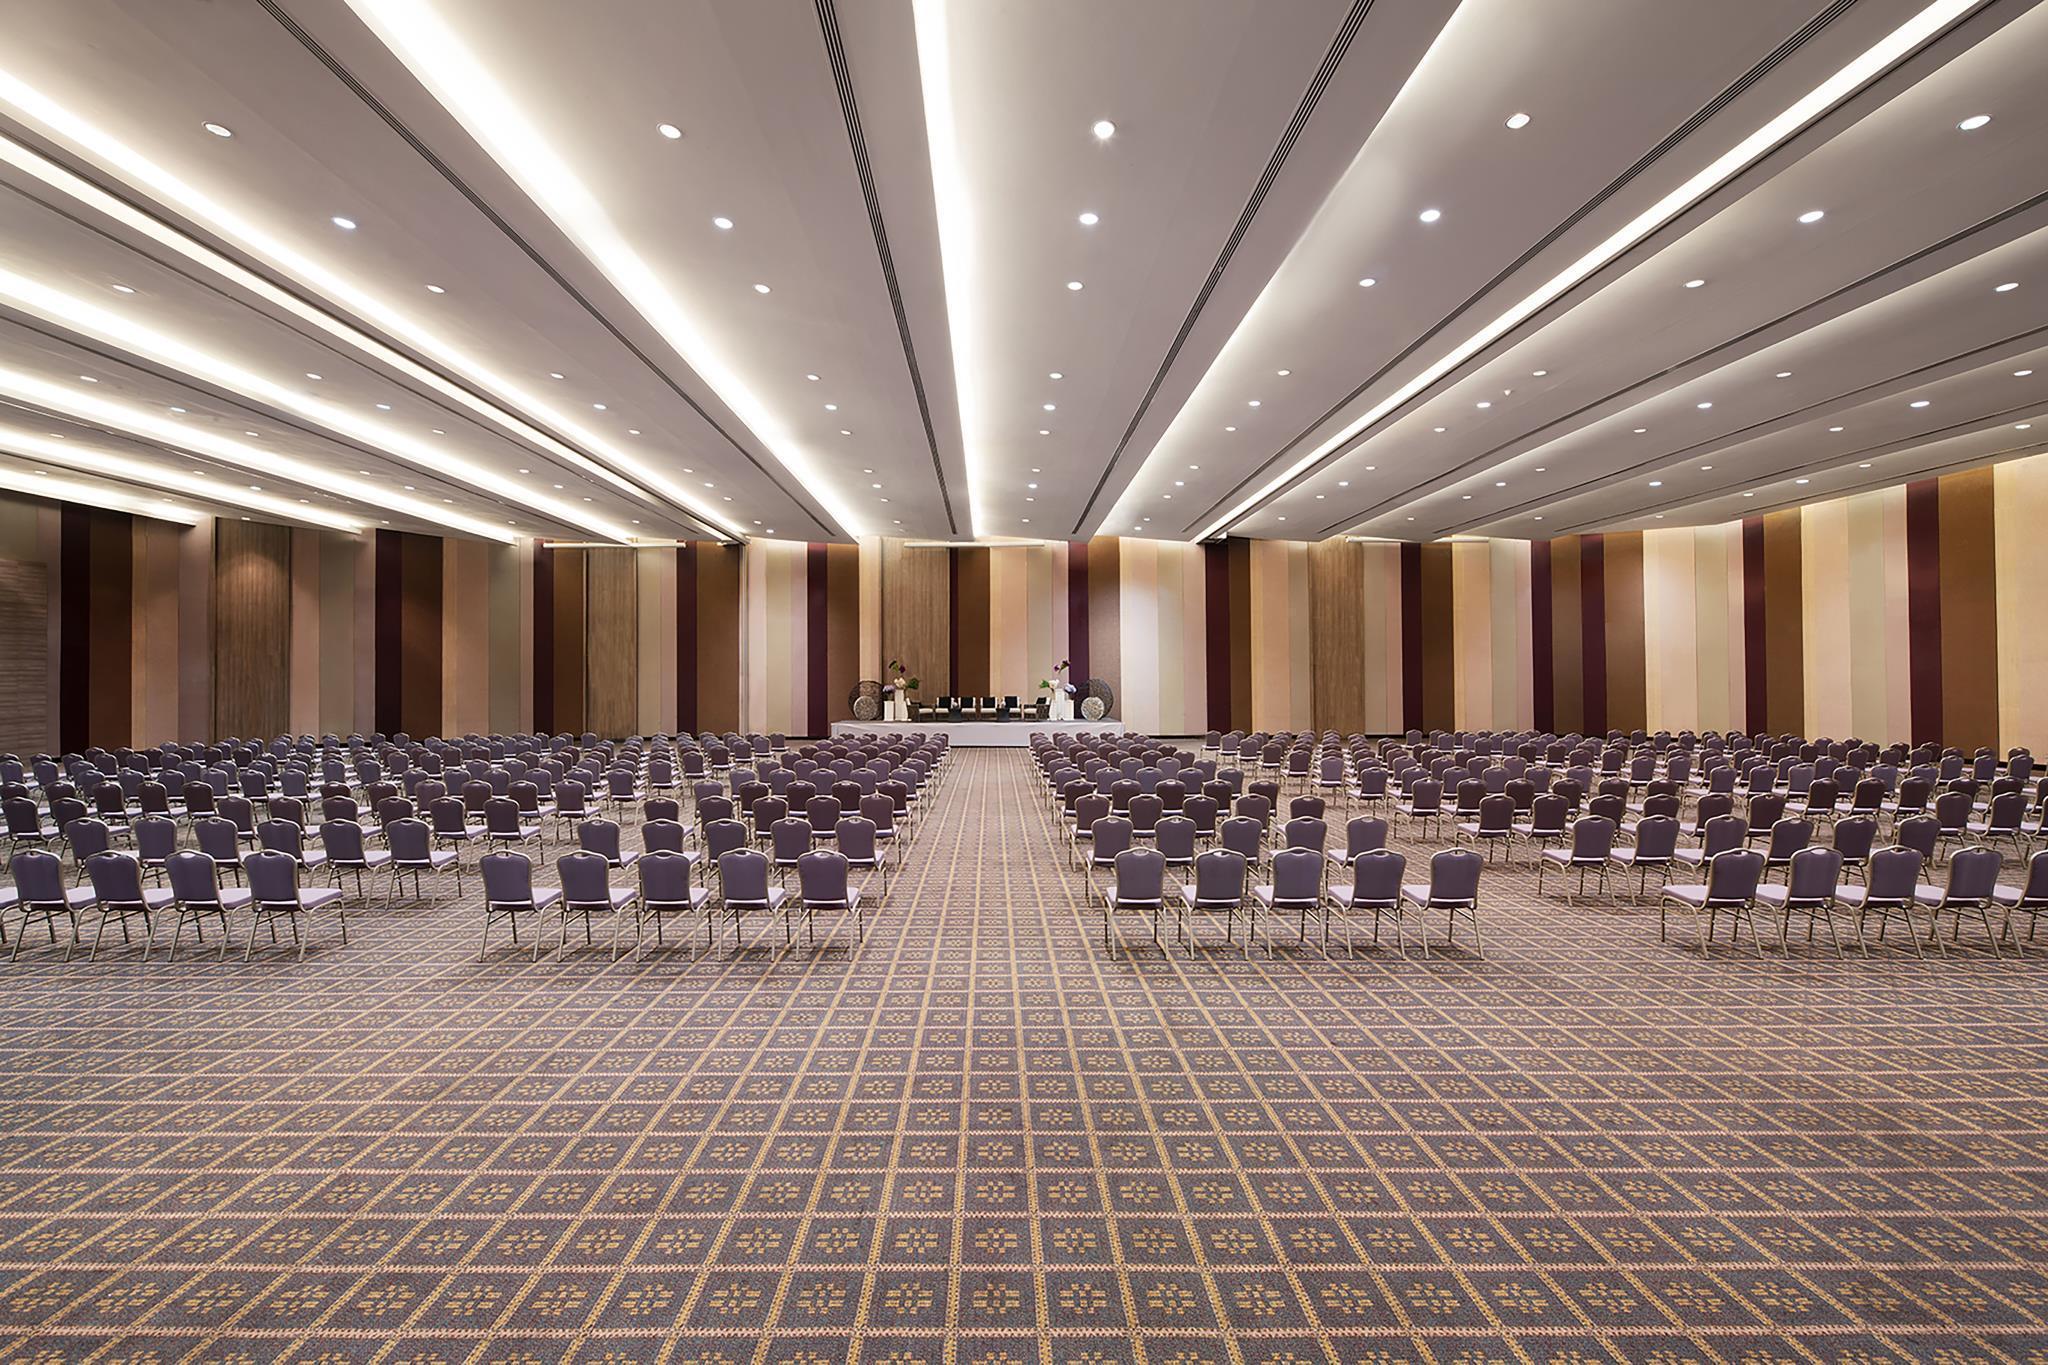 Avani Khon Kaen Hotel & Convention Centre อวานี ขอนแก่น โฮเต็ล แอนด์ คอนเวนชั่น เซ็นเตอร์